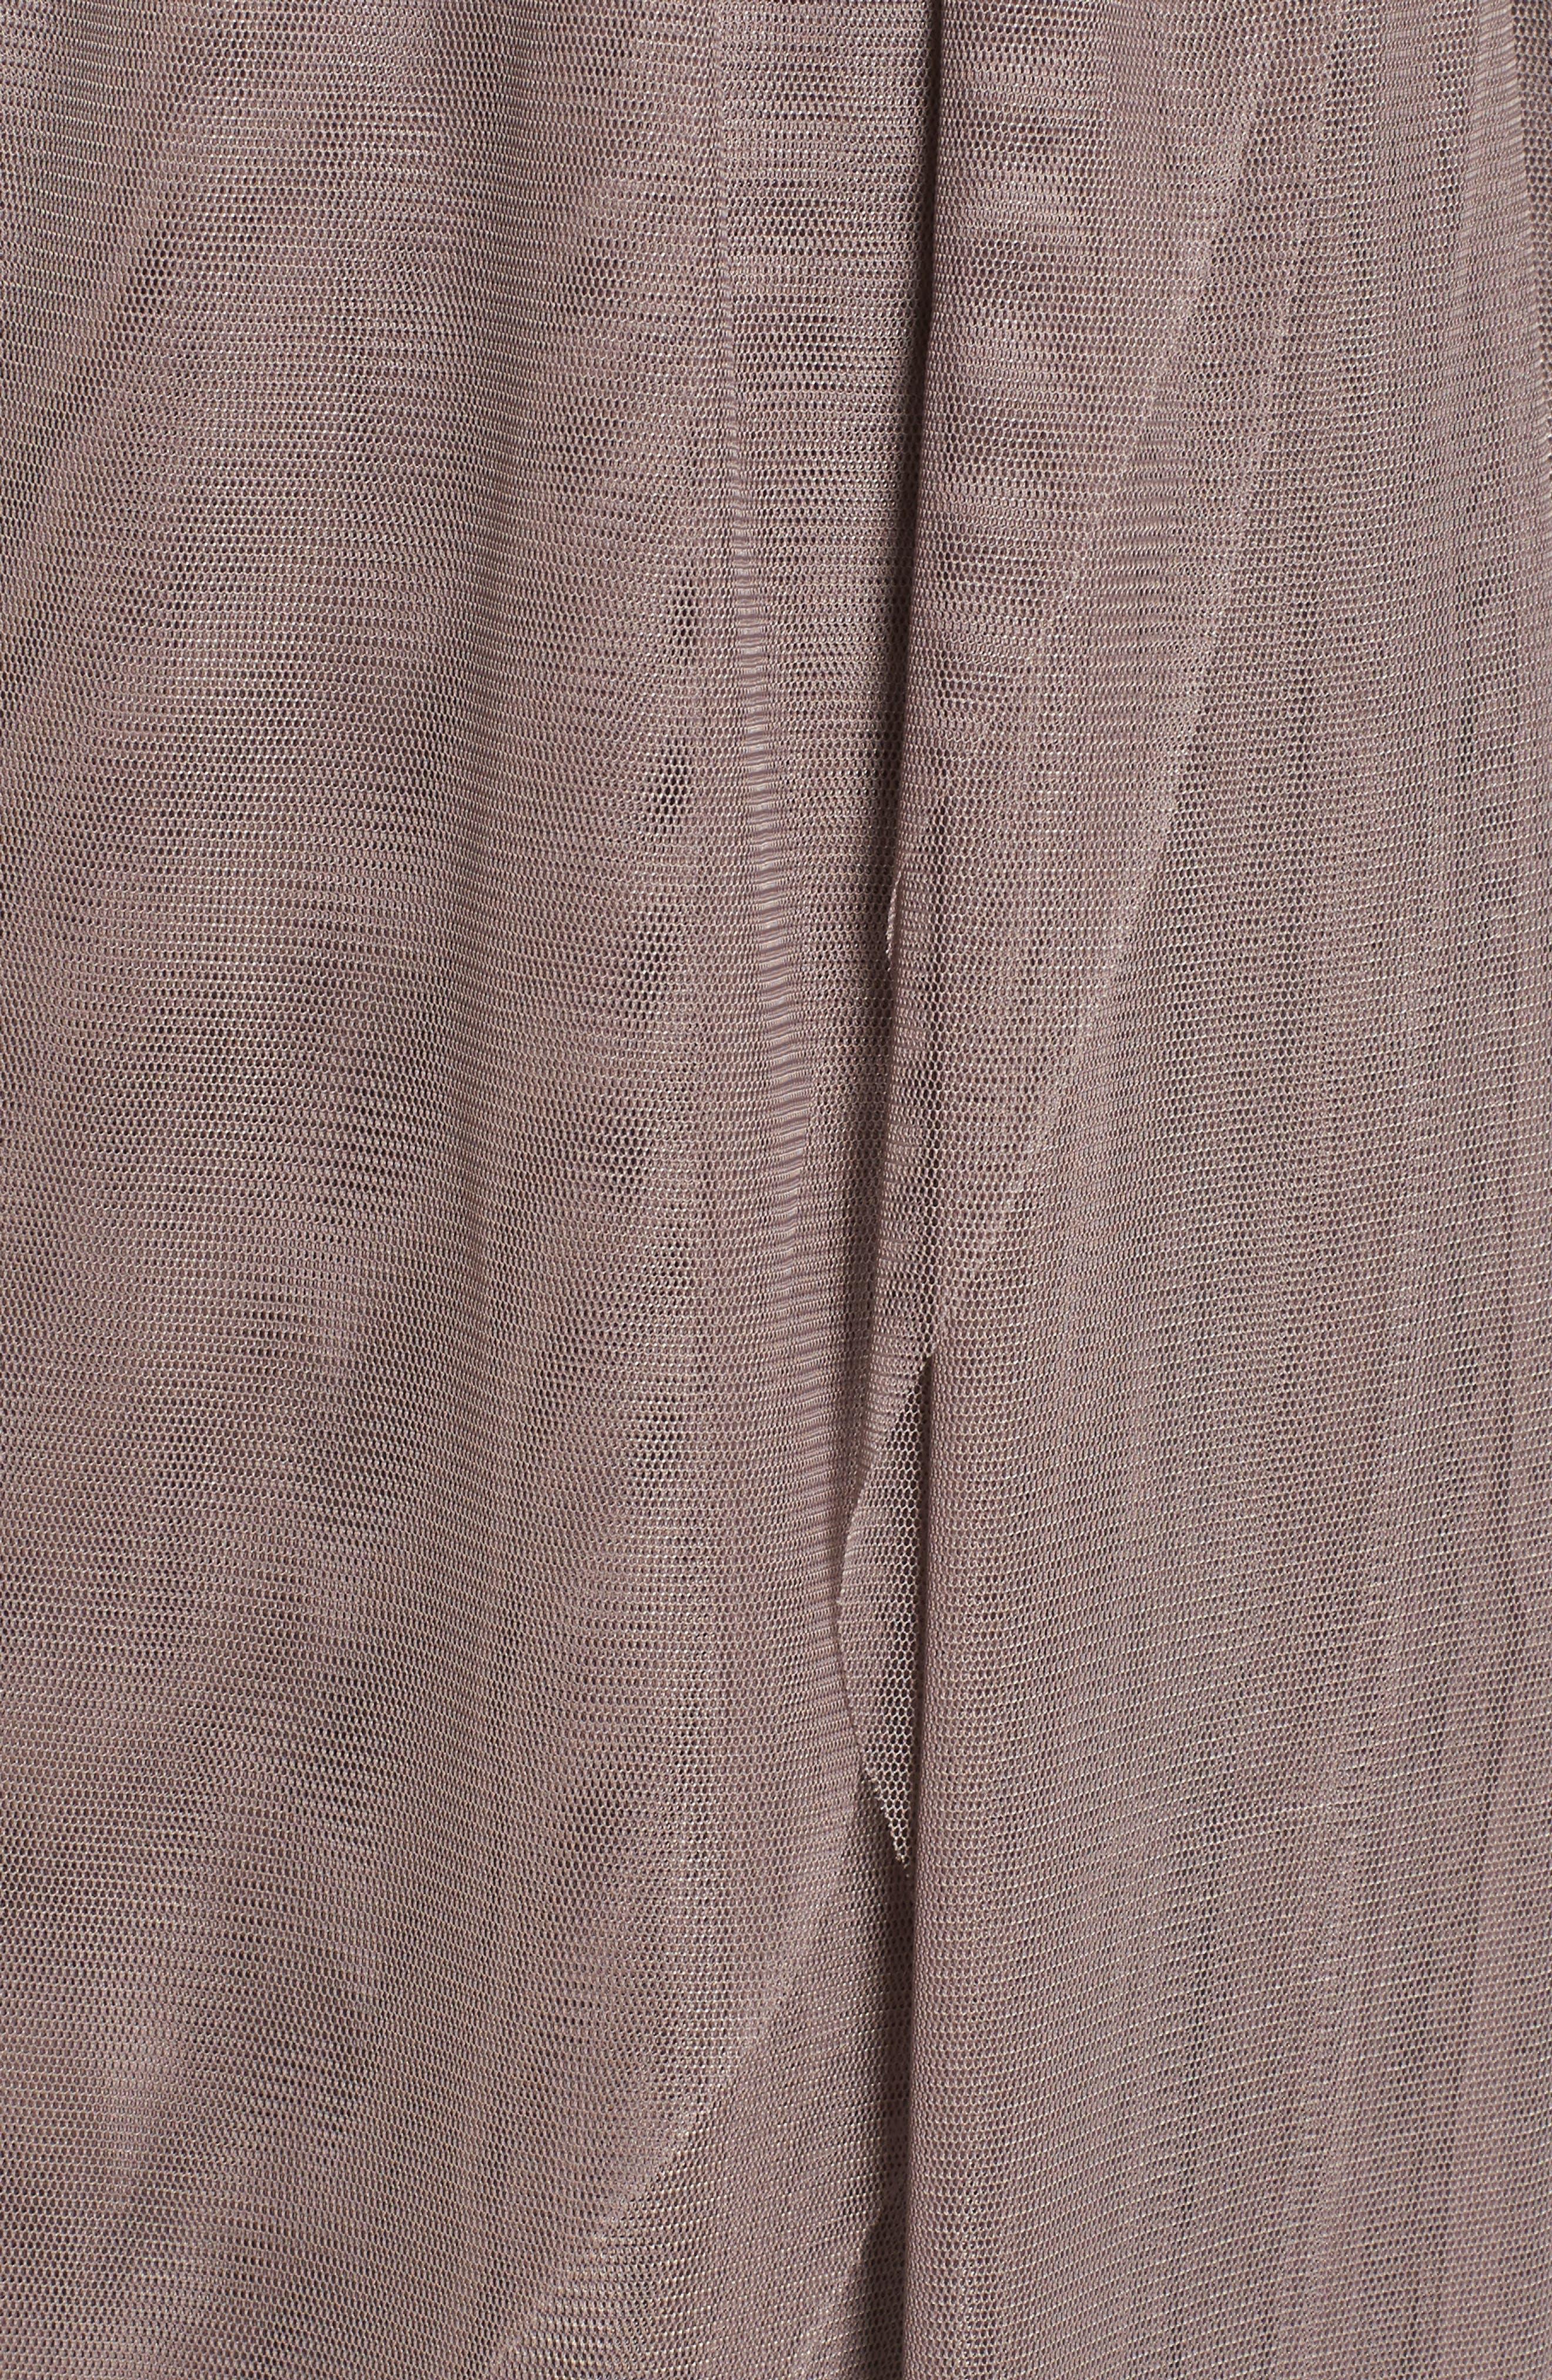 Mixed Media Midi Dress,                             Alternate thumbnail 5, color,                             238